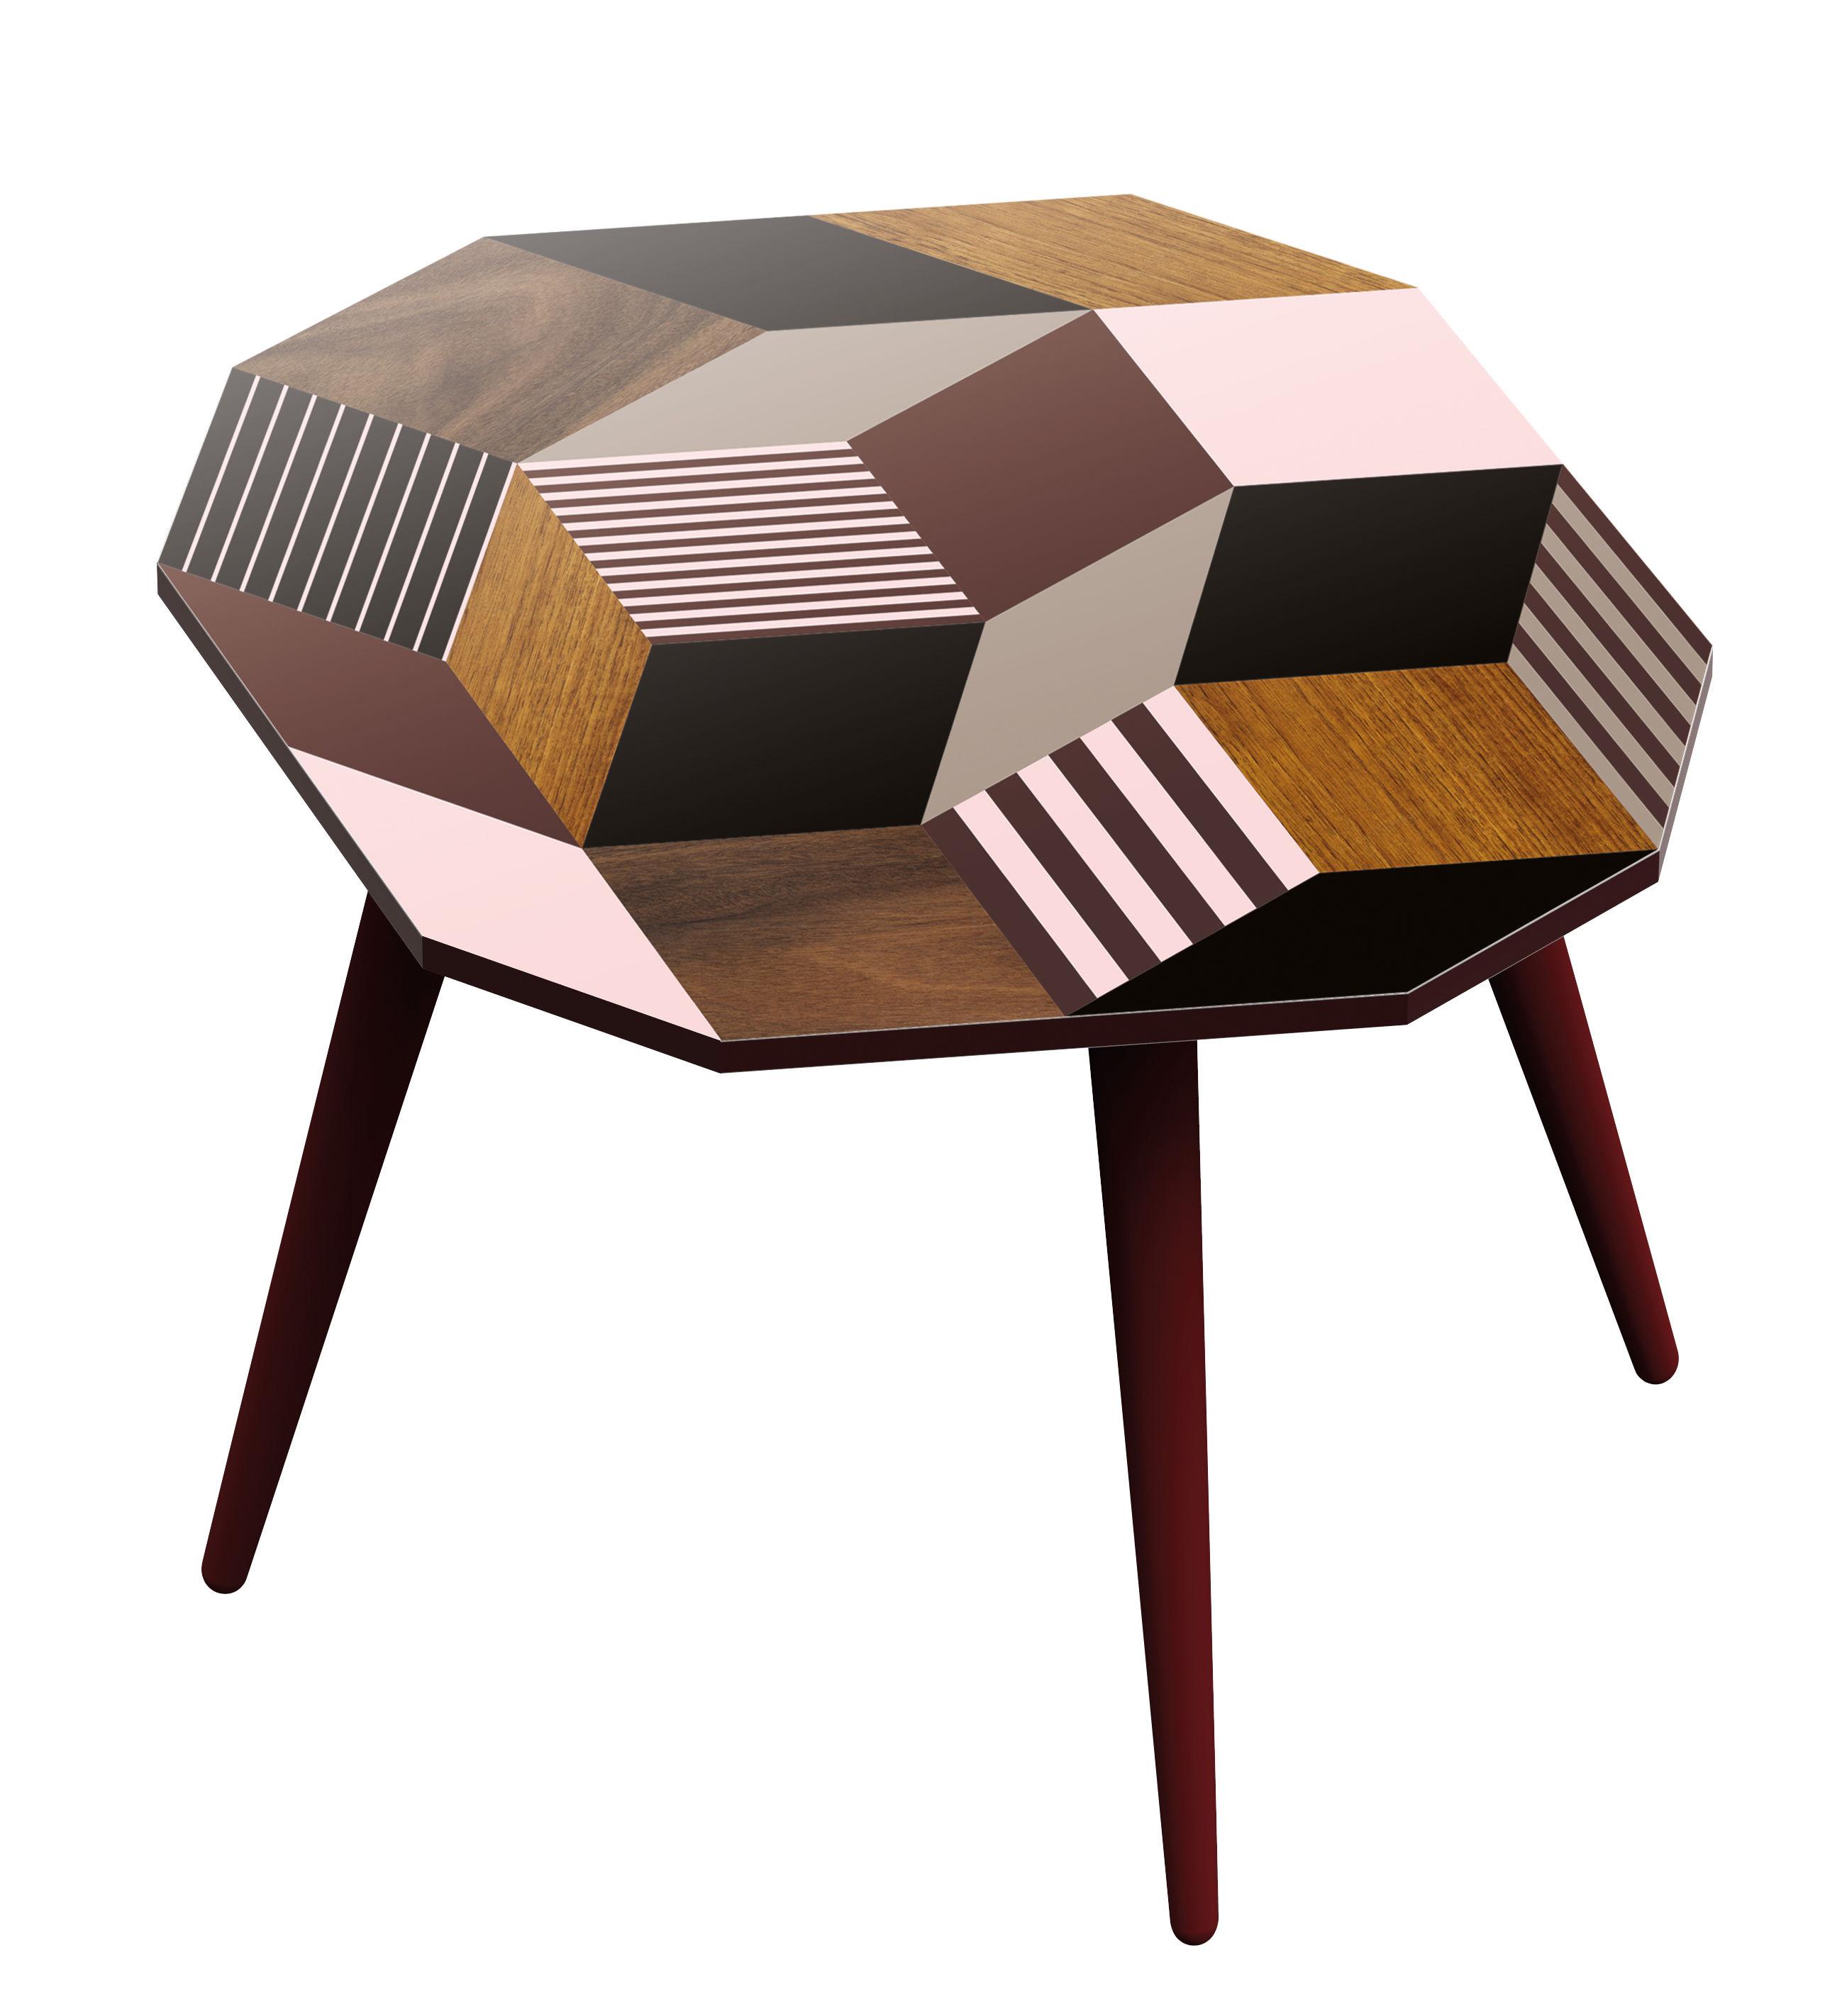 Penrose fancywood medium coffee table 39 x 41 cm x h 35 - Table basse gigogne fly ...